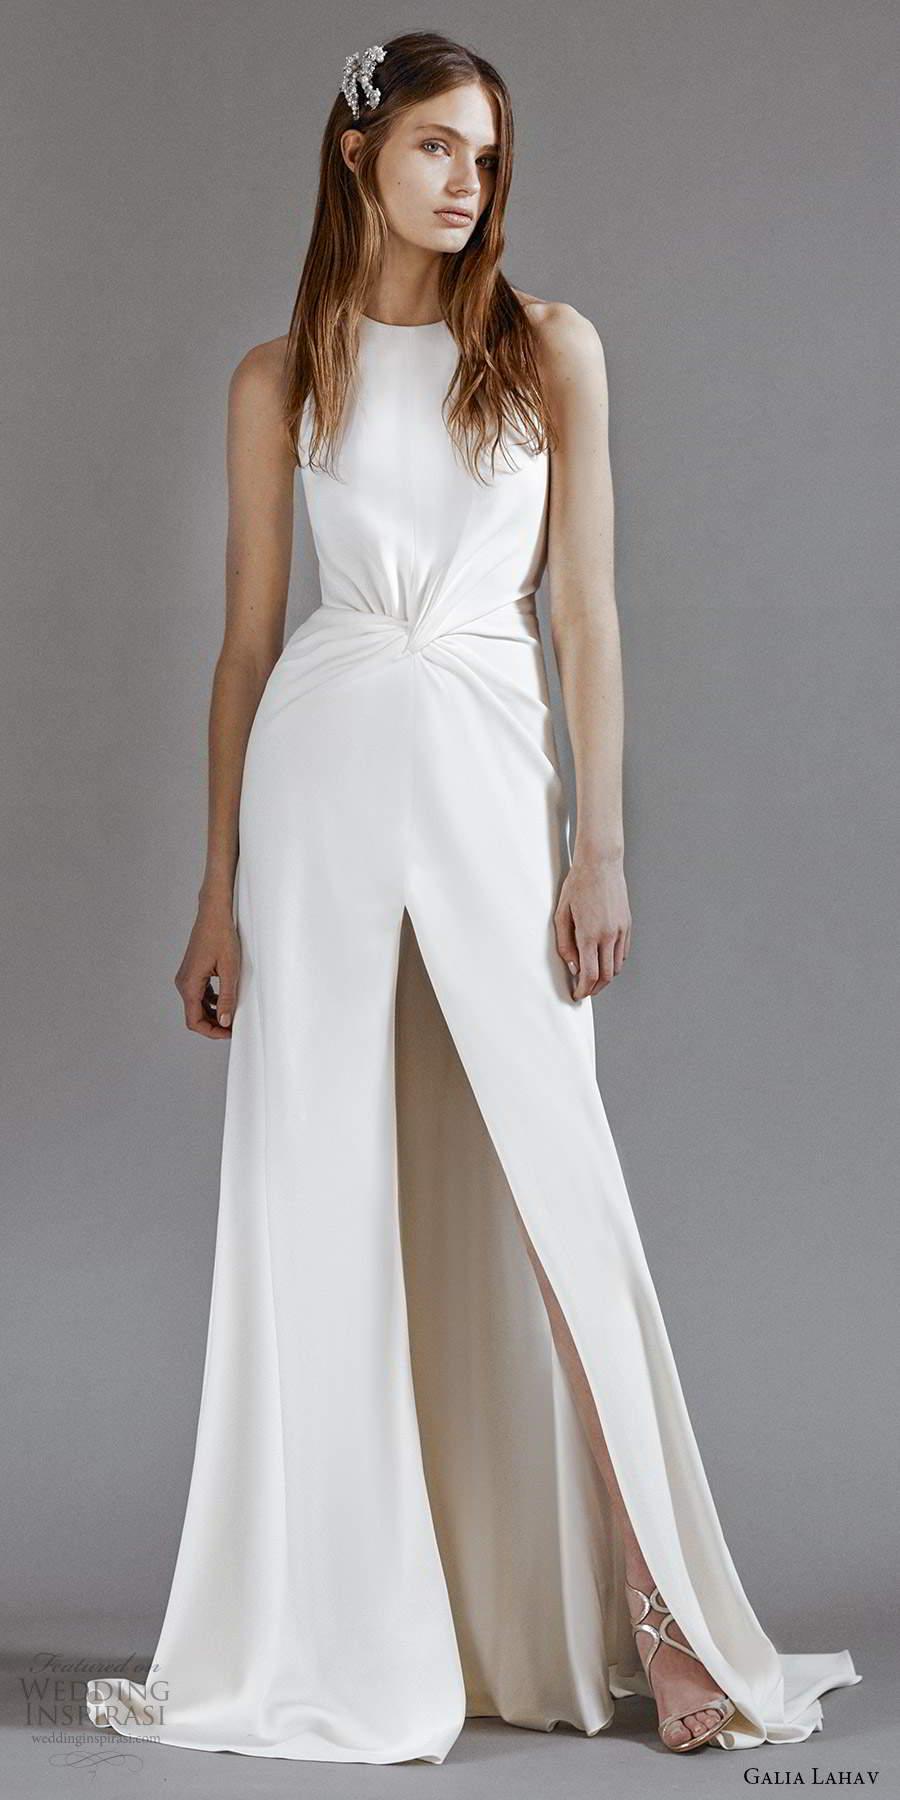 galia lahav 2021 rtw bridal sleeveless jewel neckline ruched waist clean minimalist a line wedding dress slit skirt sweep train (10) mv